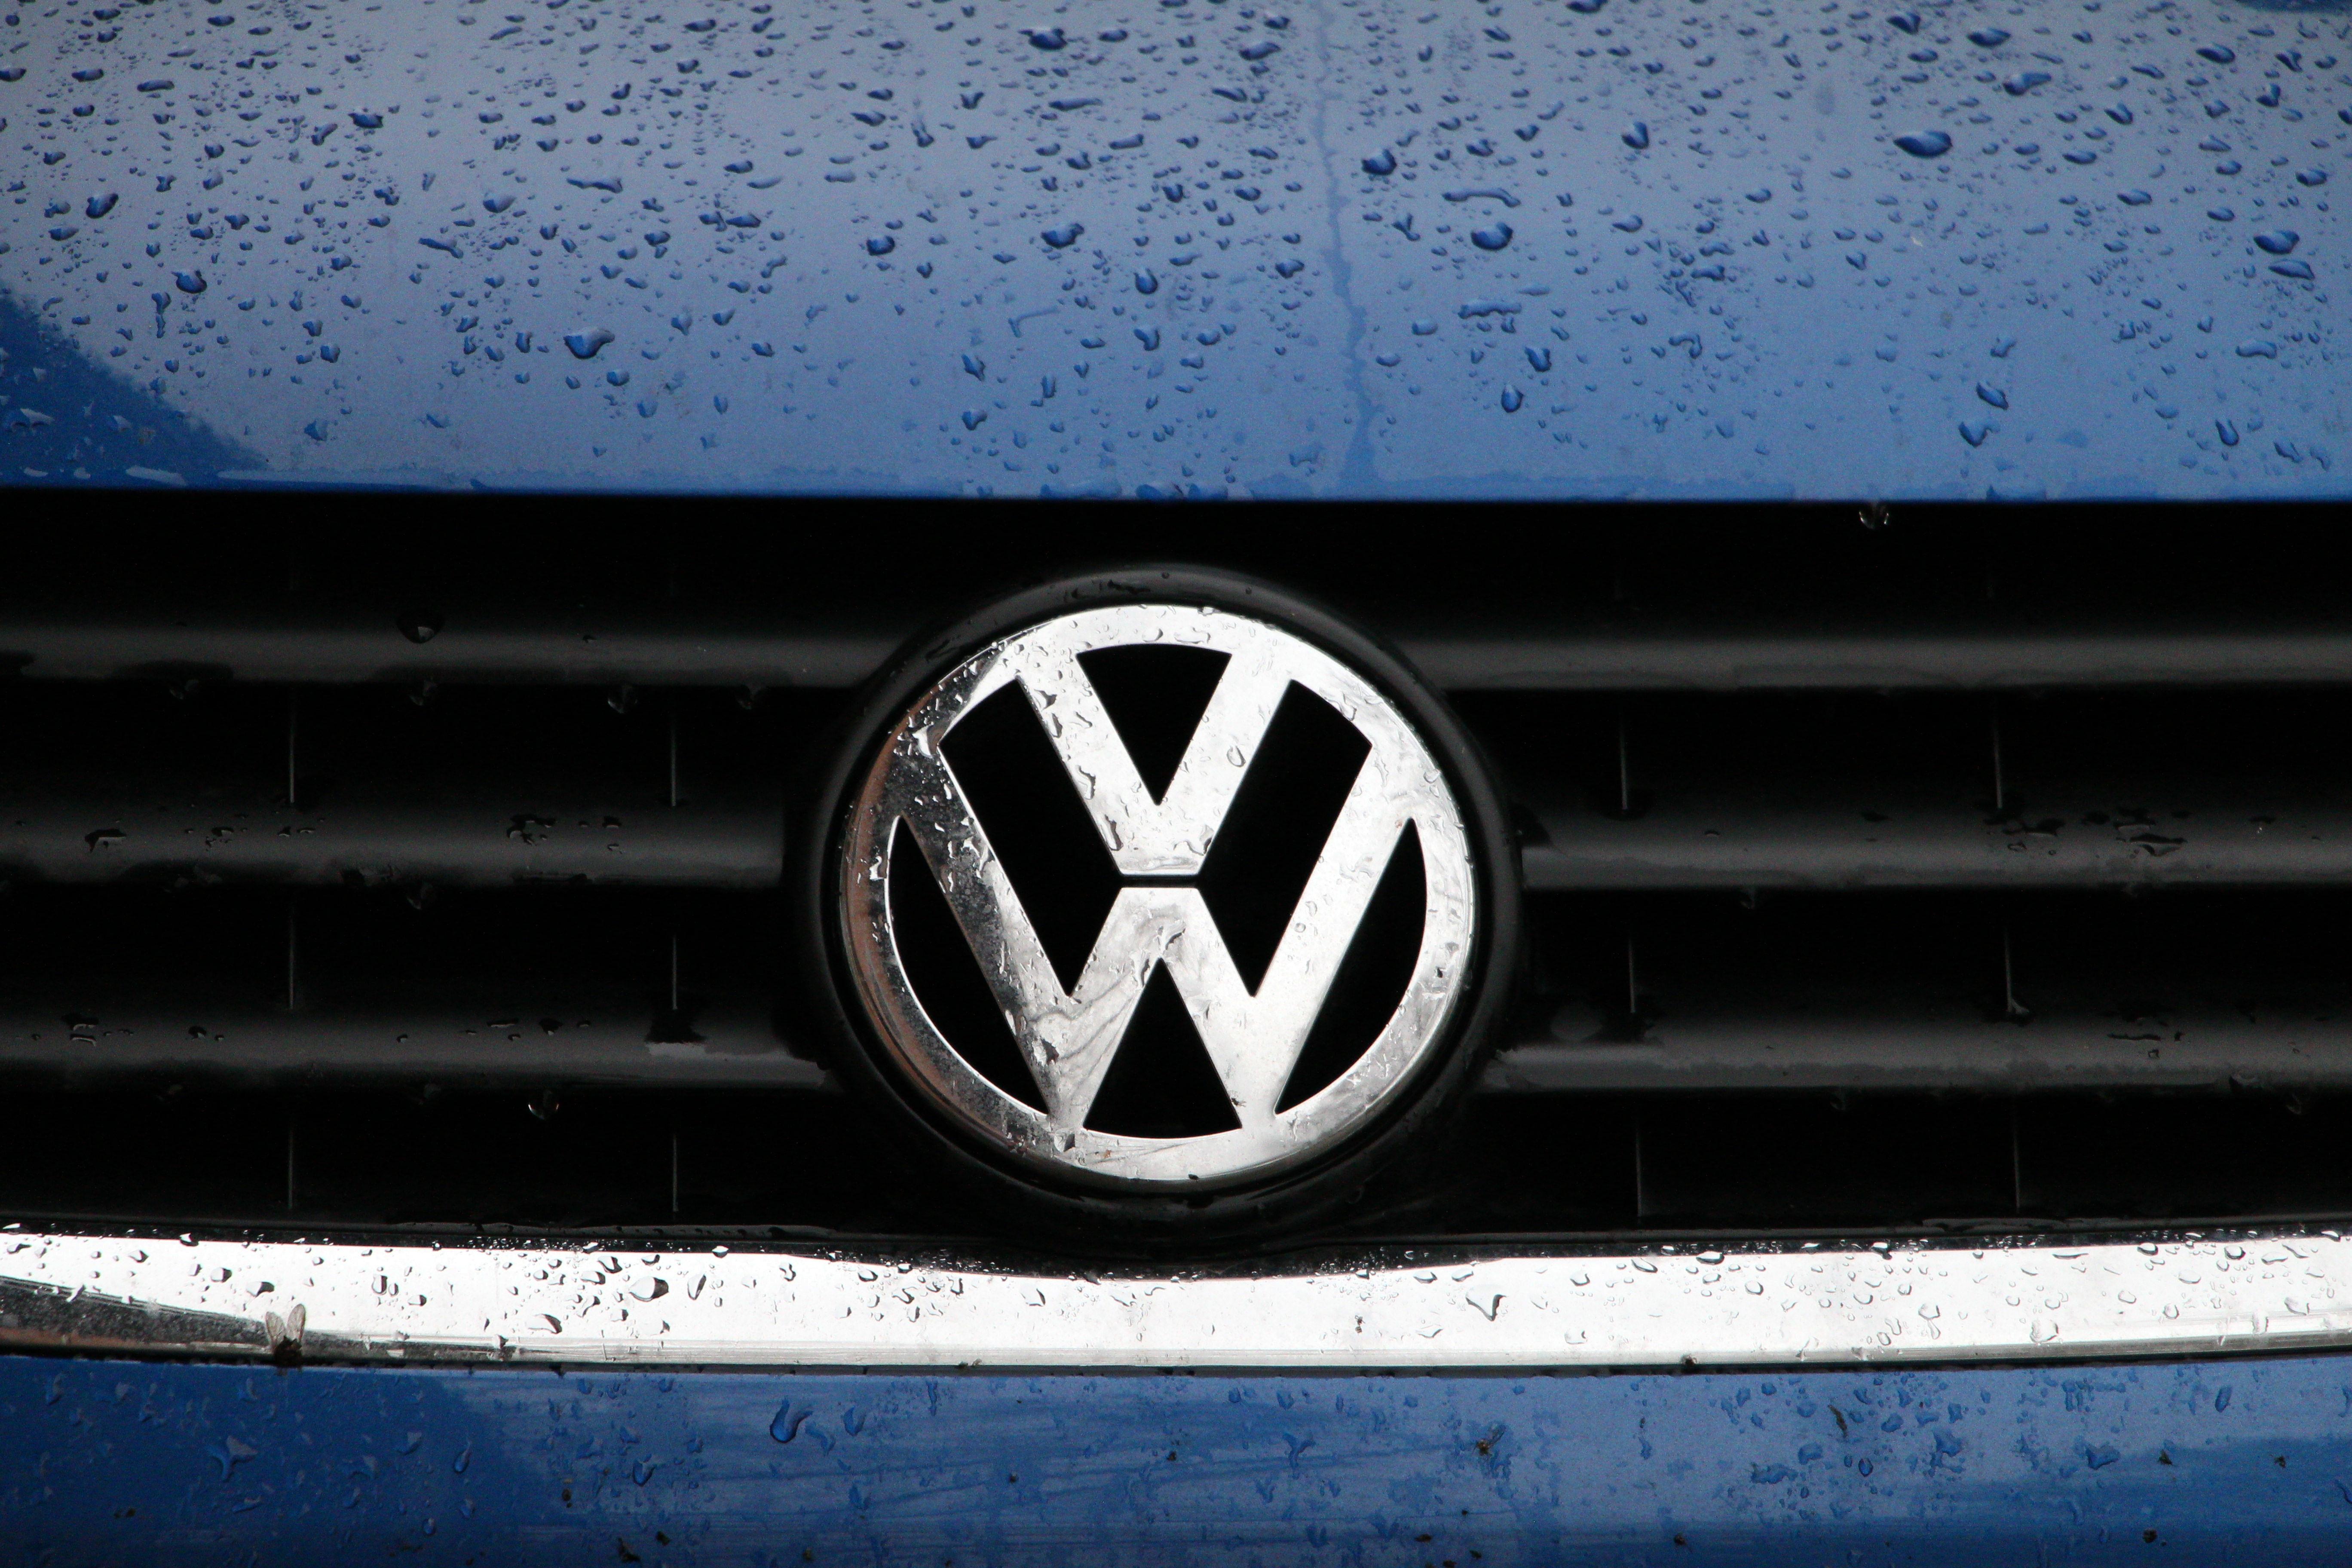 Free Images : light, car, wheel, rain, number, vw, volkswagen, wet ...